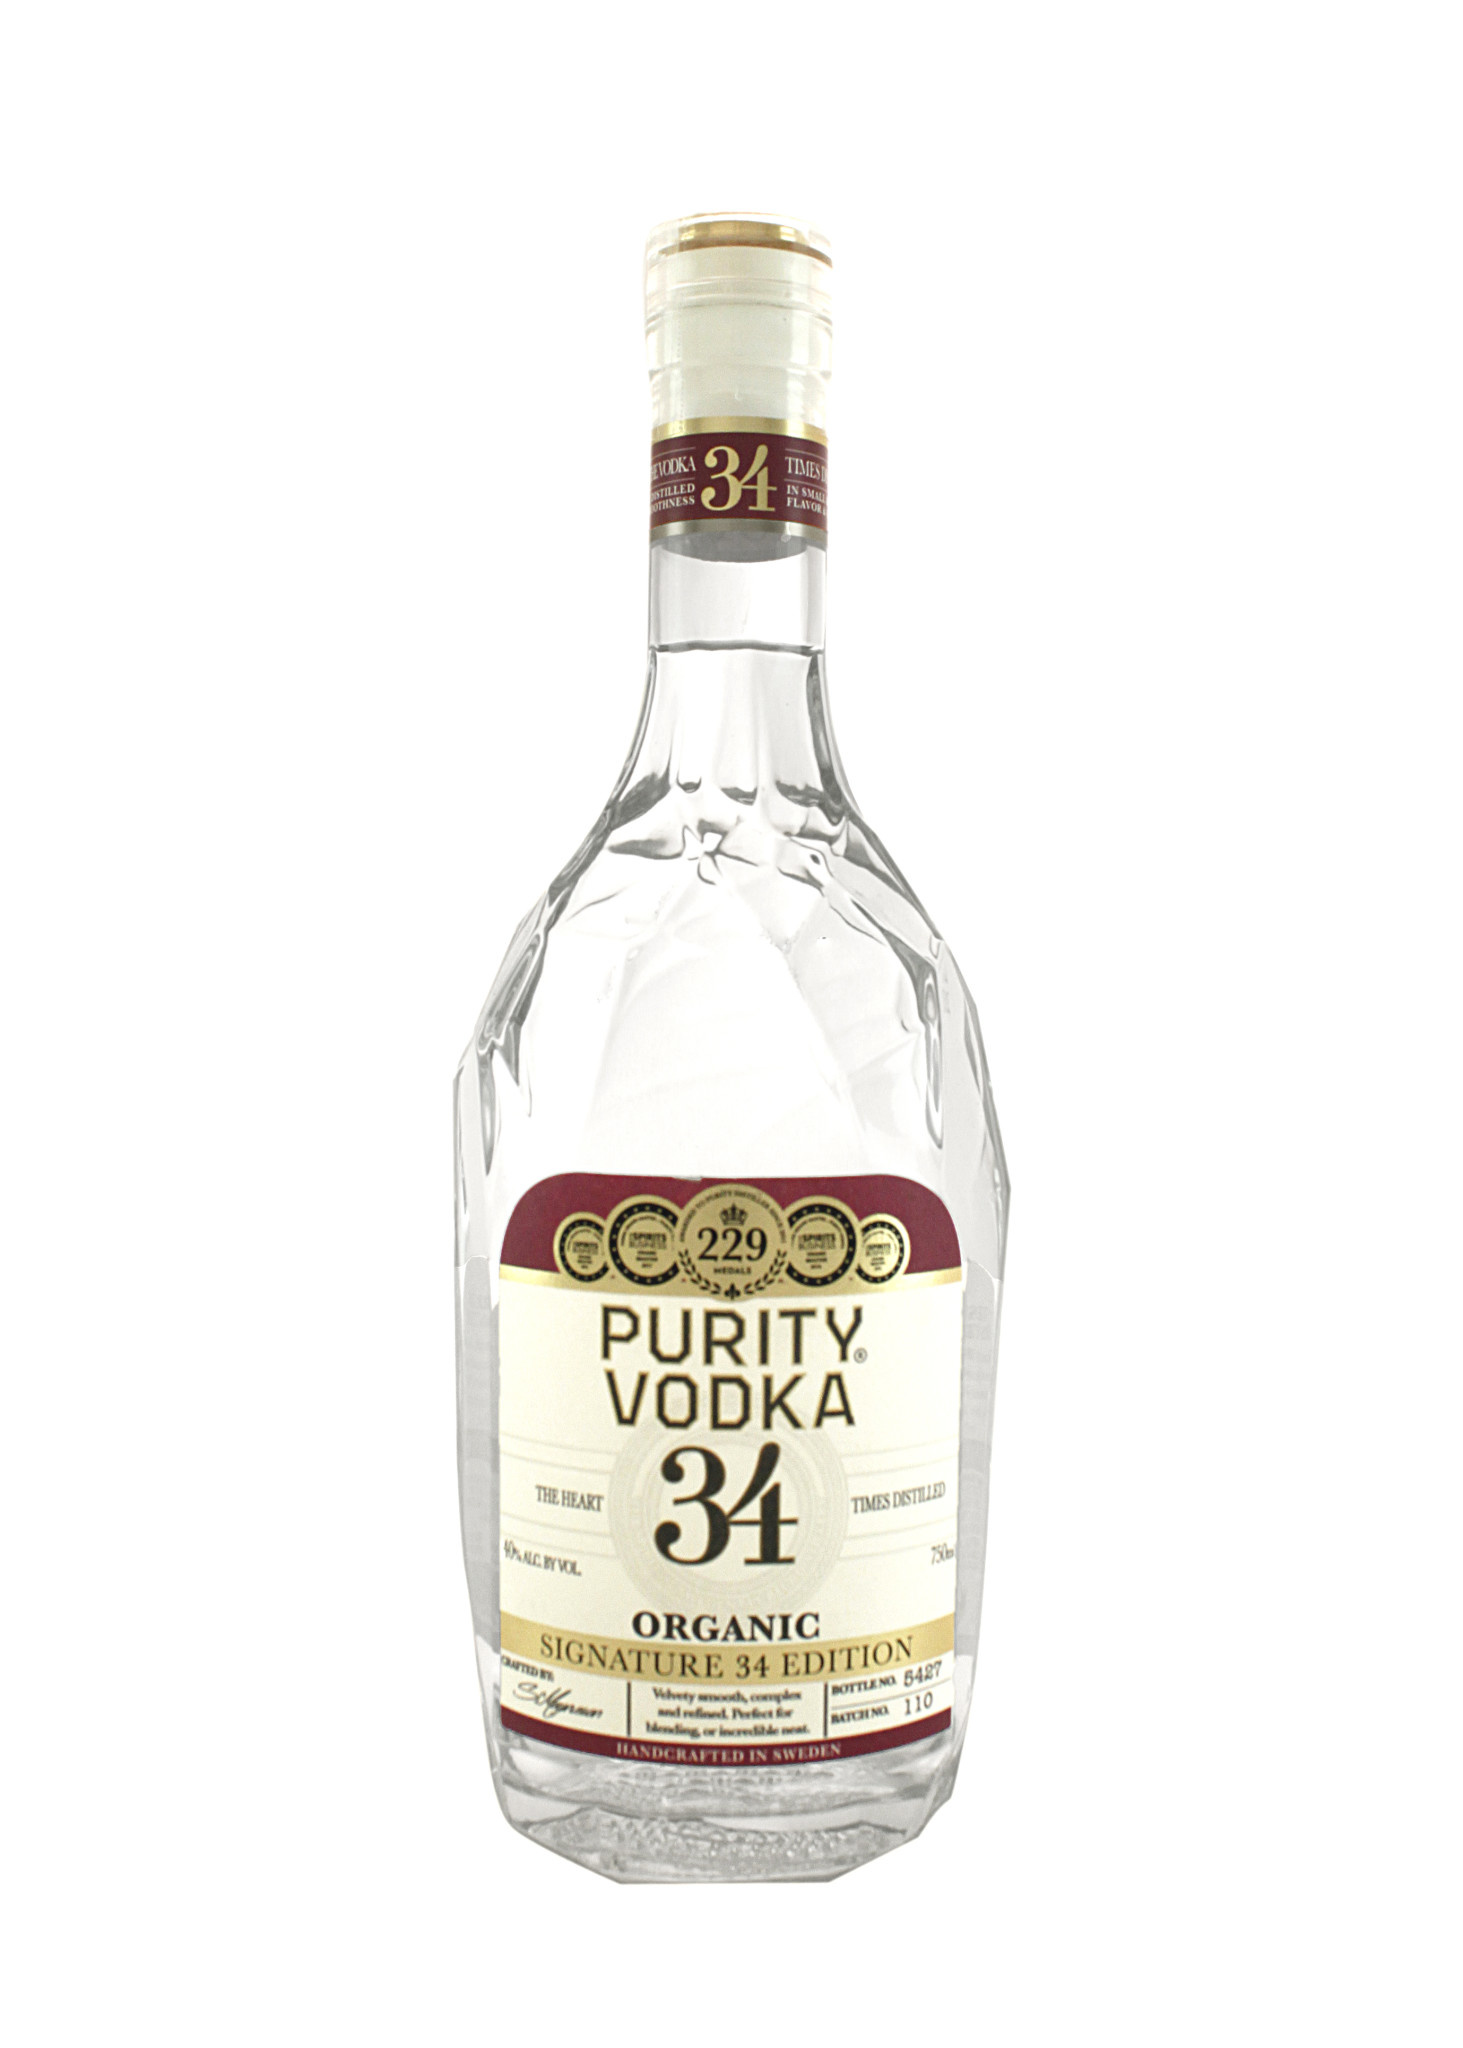 Purity Ultra 34 Times Distilled Premium Organic Vodka, Malmo, Sweden